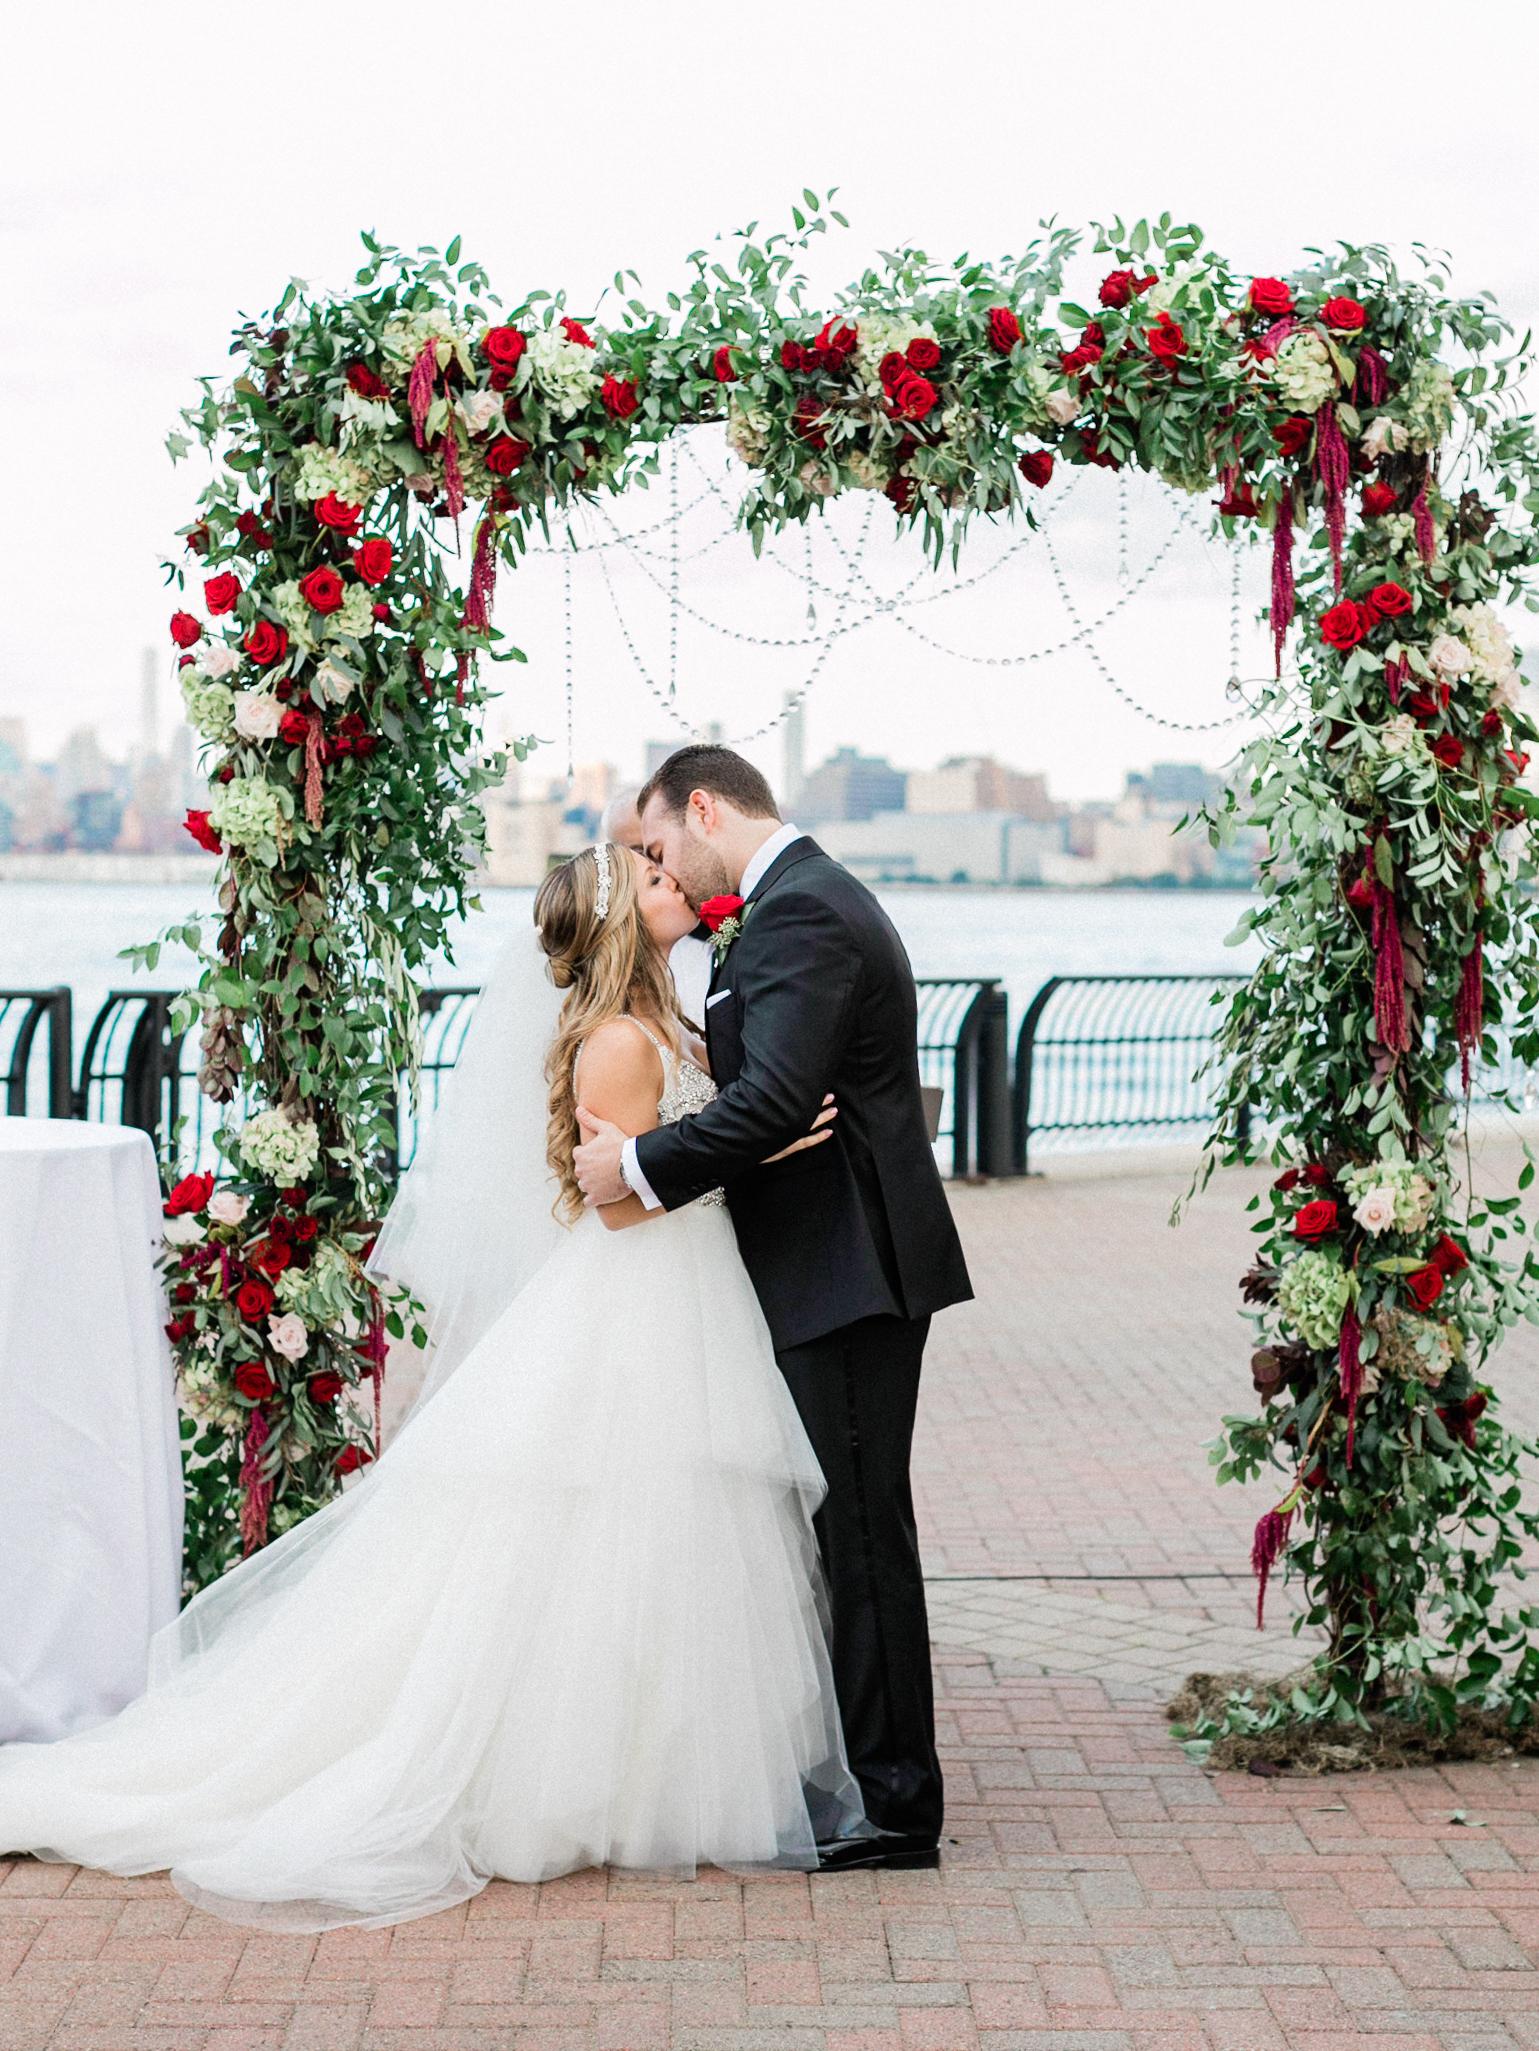 hyatt-regency-jersey-city-wedding-photographer47.jpg